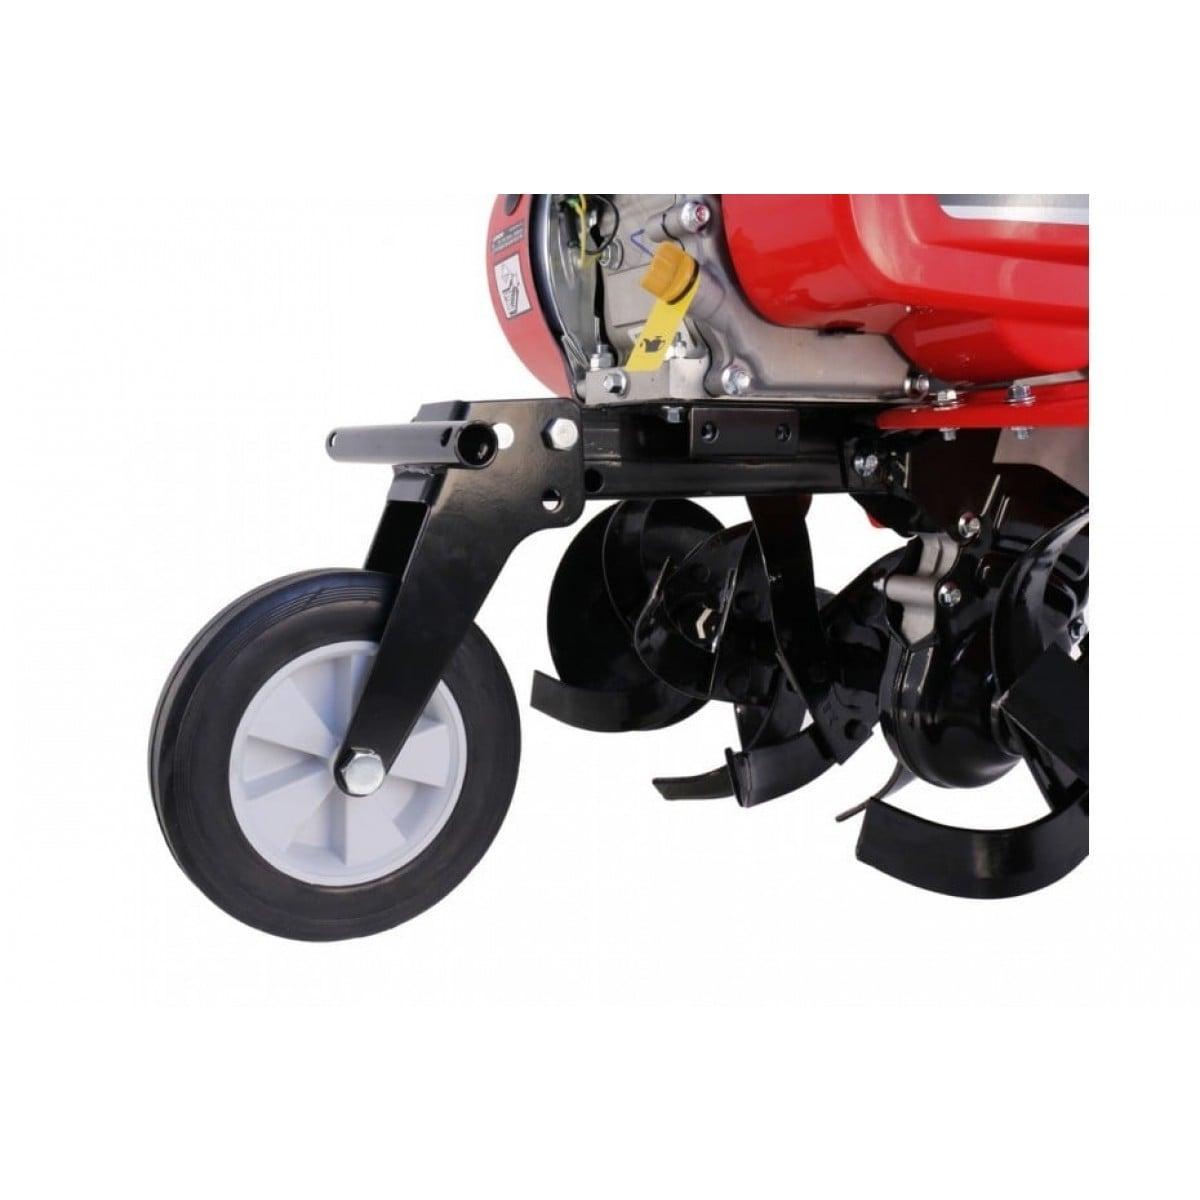 motocultor loncin lc750 7cp o mac.ro 3 2 12